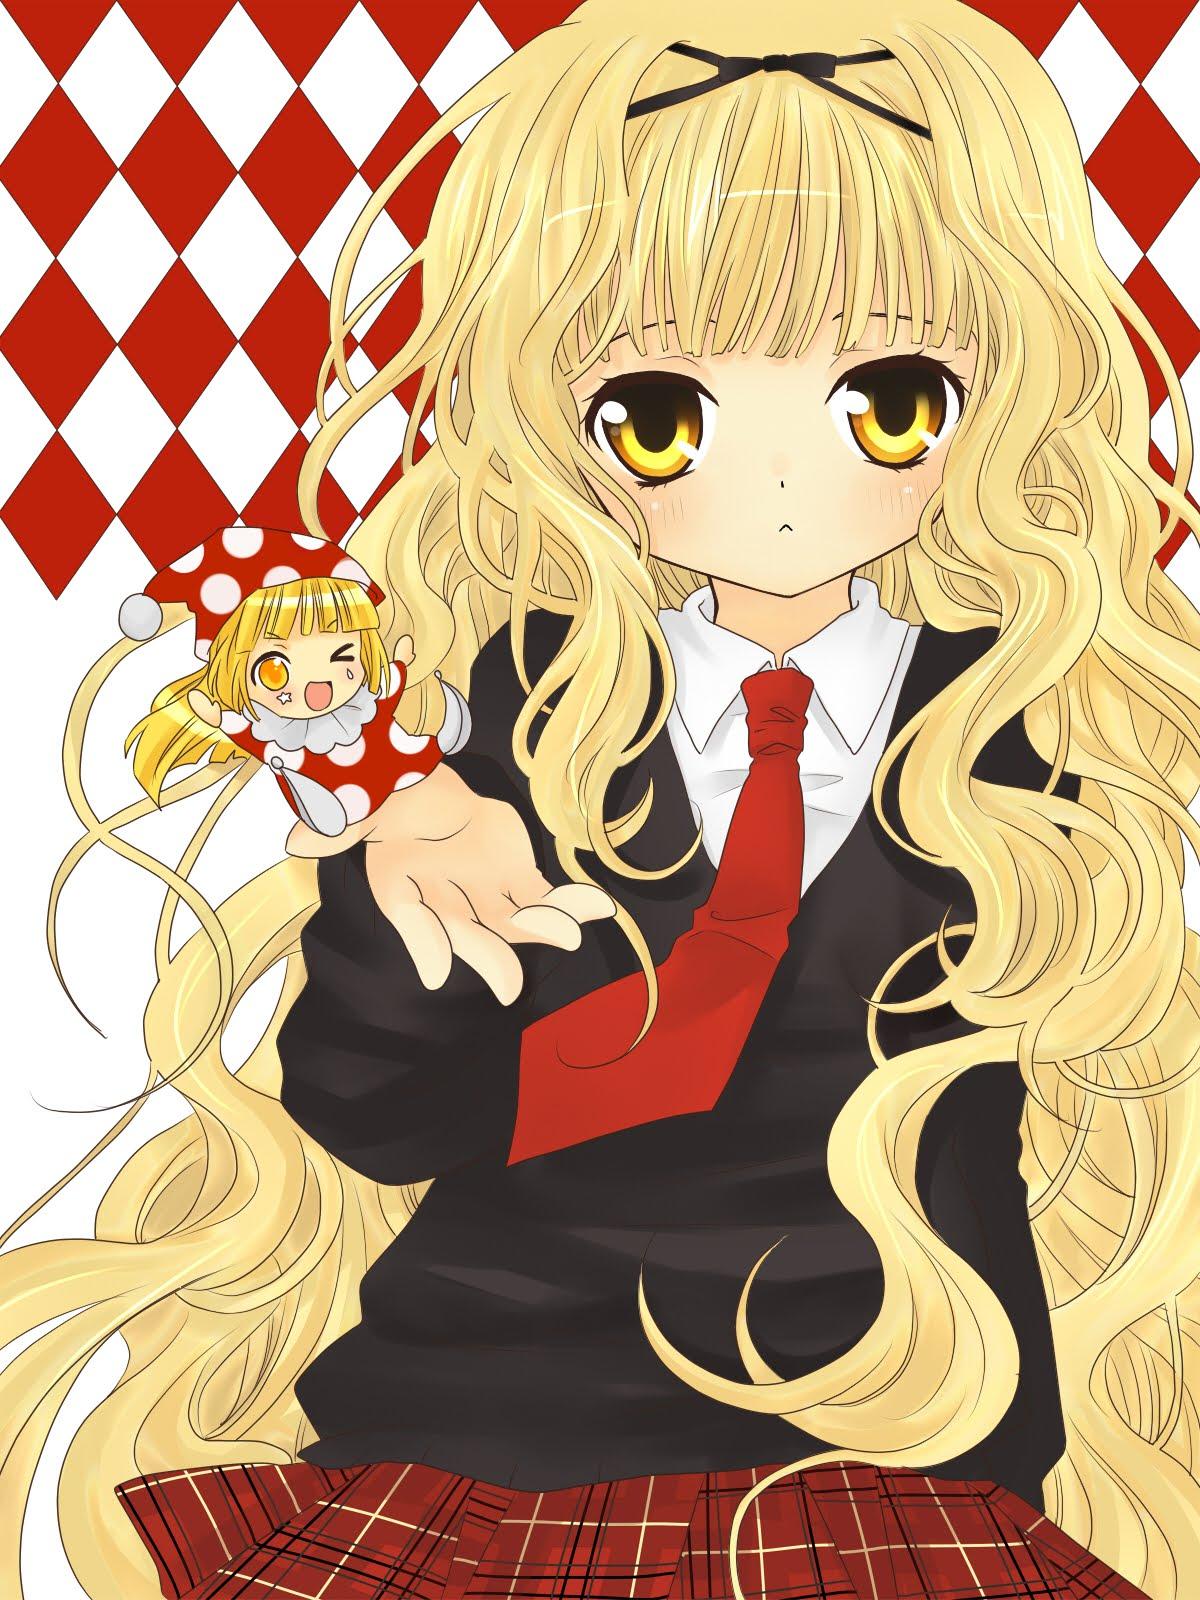 Mirar una hoja de personaje Rima-Kusu-Kusu-shugo